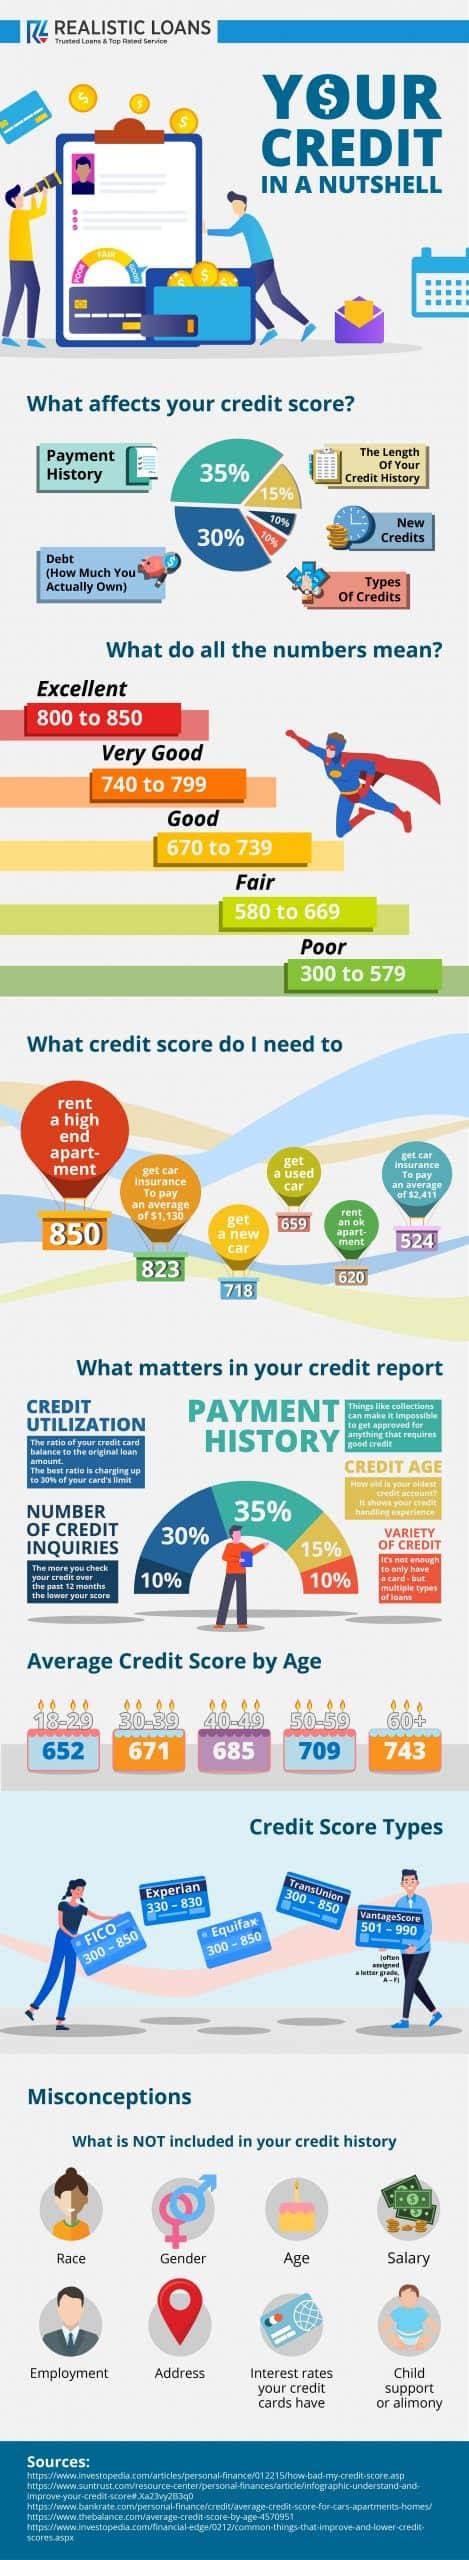 Realistic loans